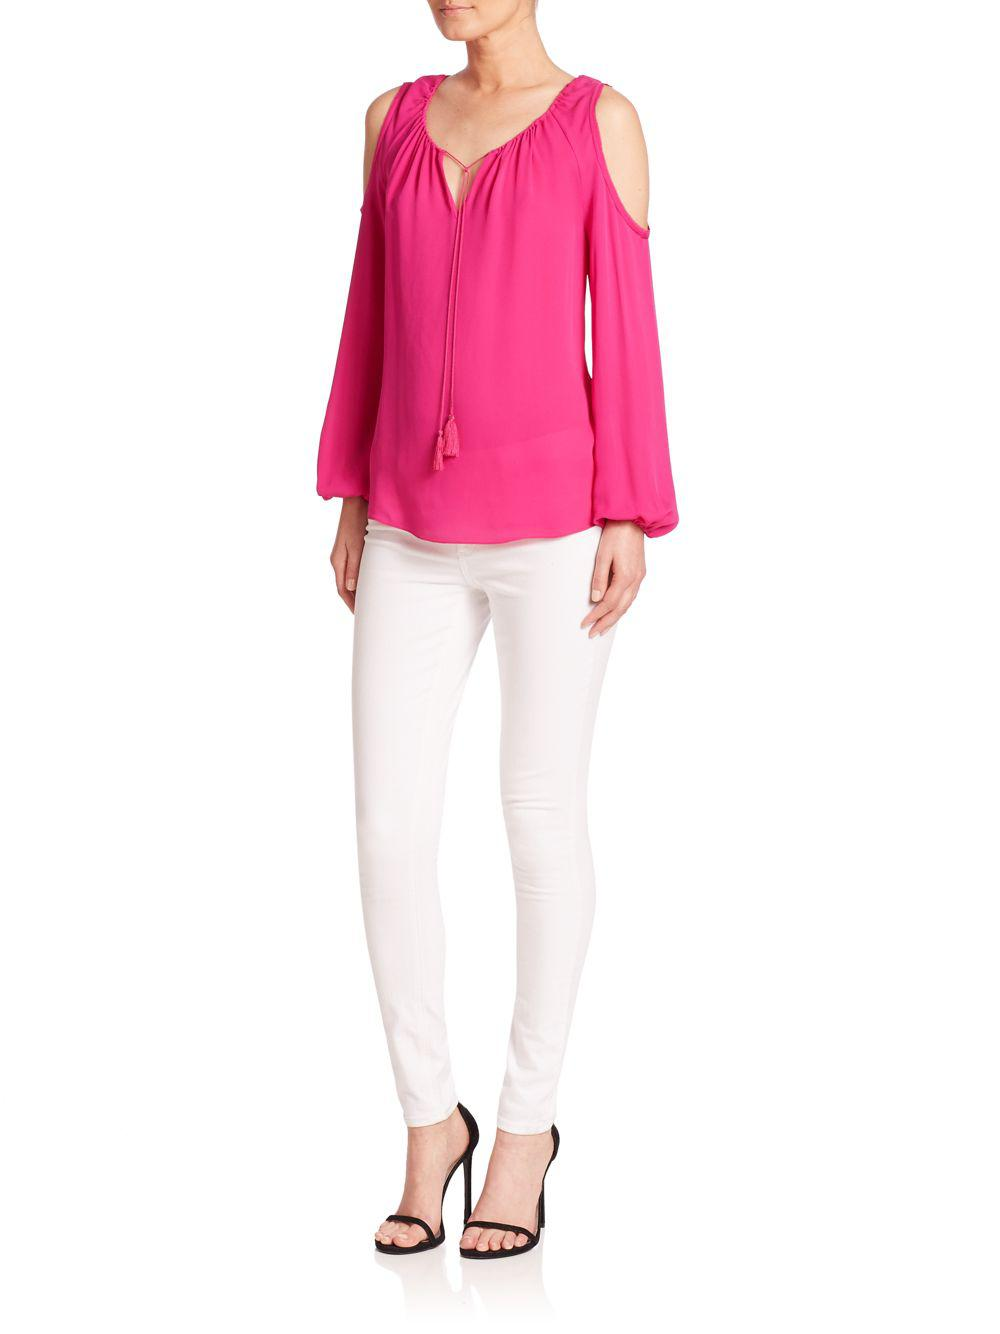 b3c3c5f5efe9f8 Lyst - Elie Tahari Cathy Silk Cold-shoulder Blouse in Pink